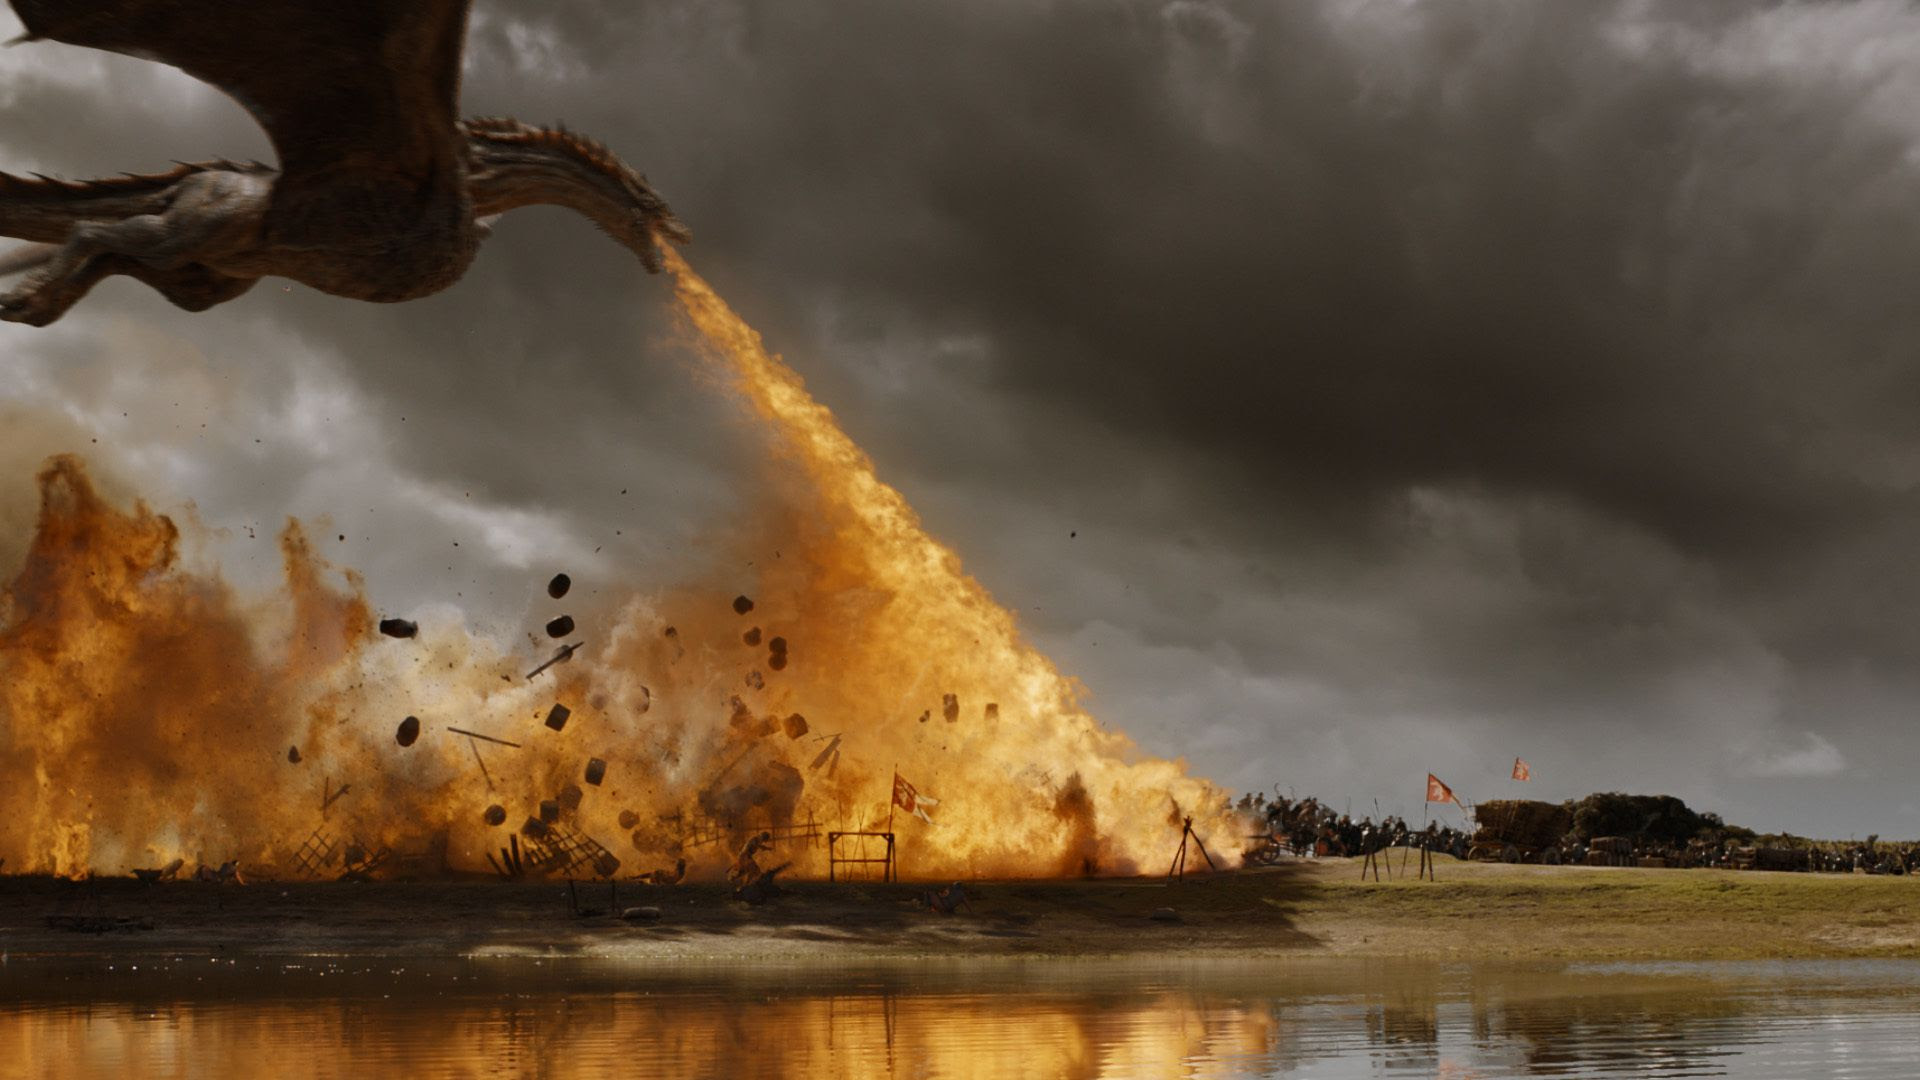 Ranking The Best Game Of Thrones Battle Scenes The Boston Globe